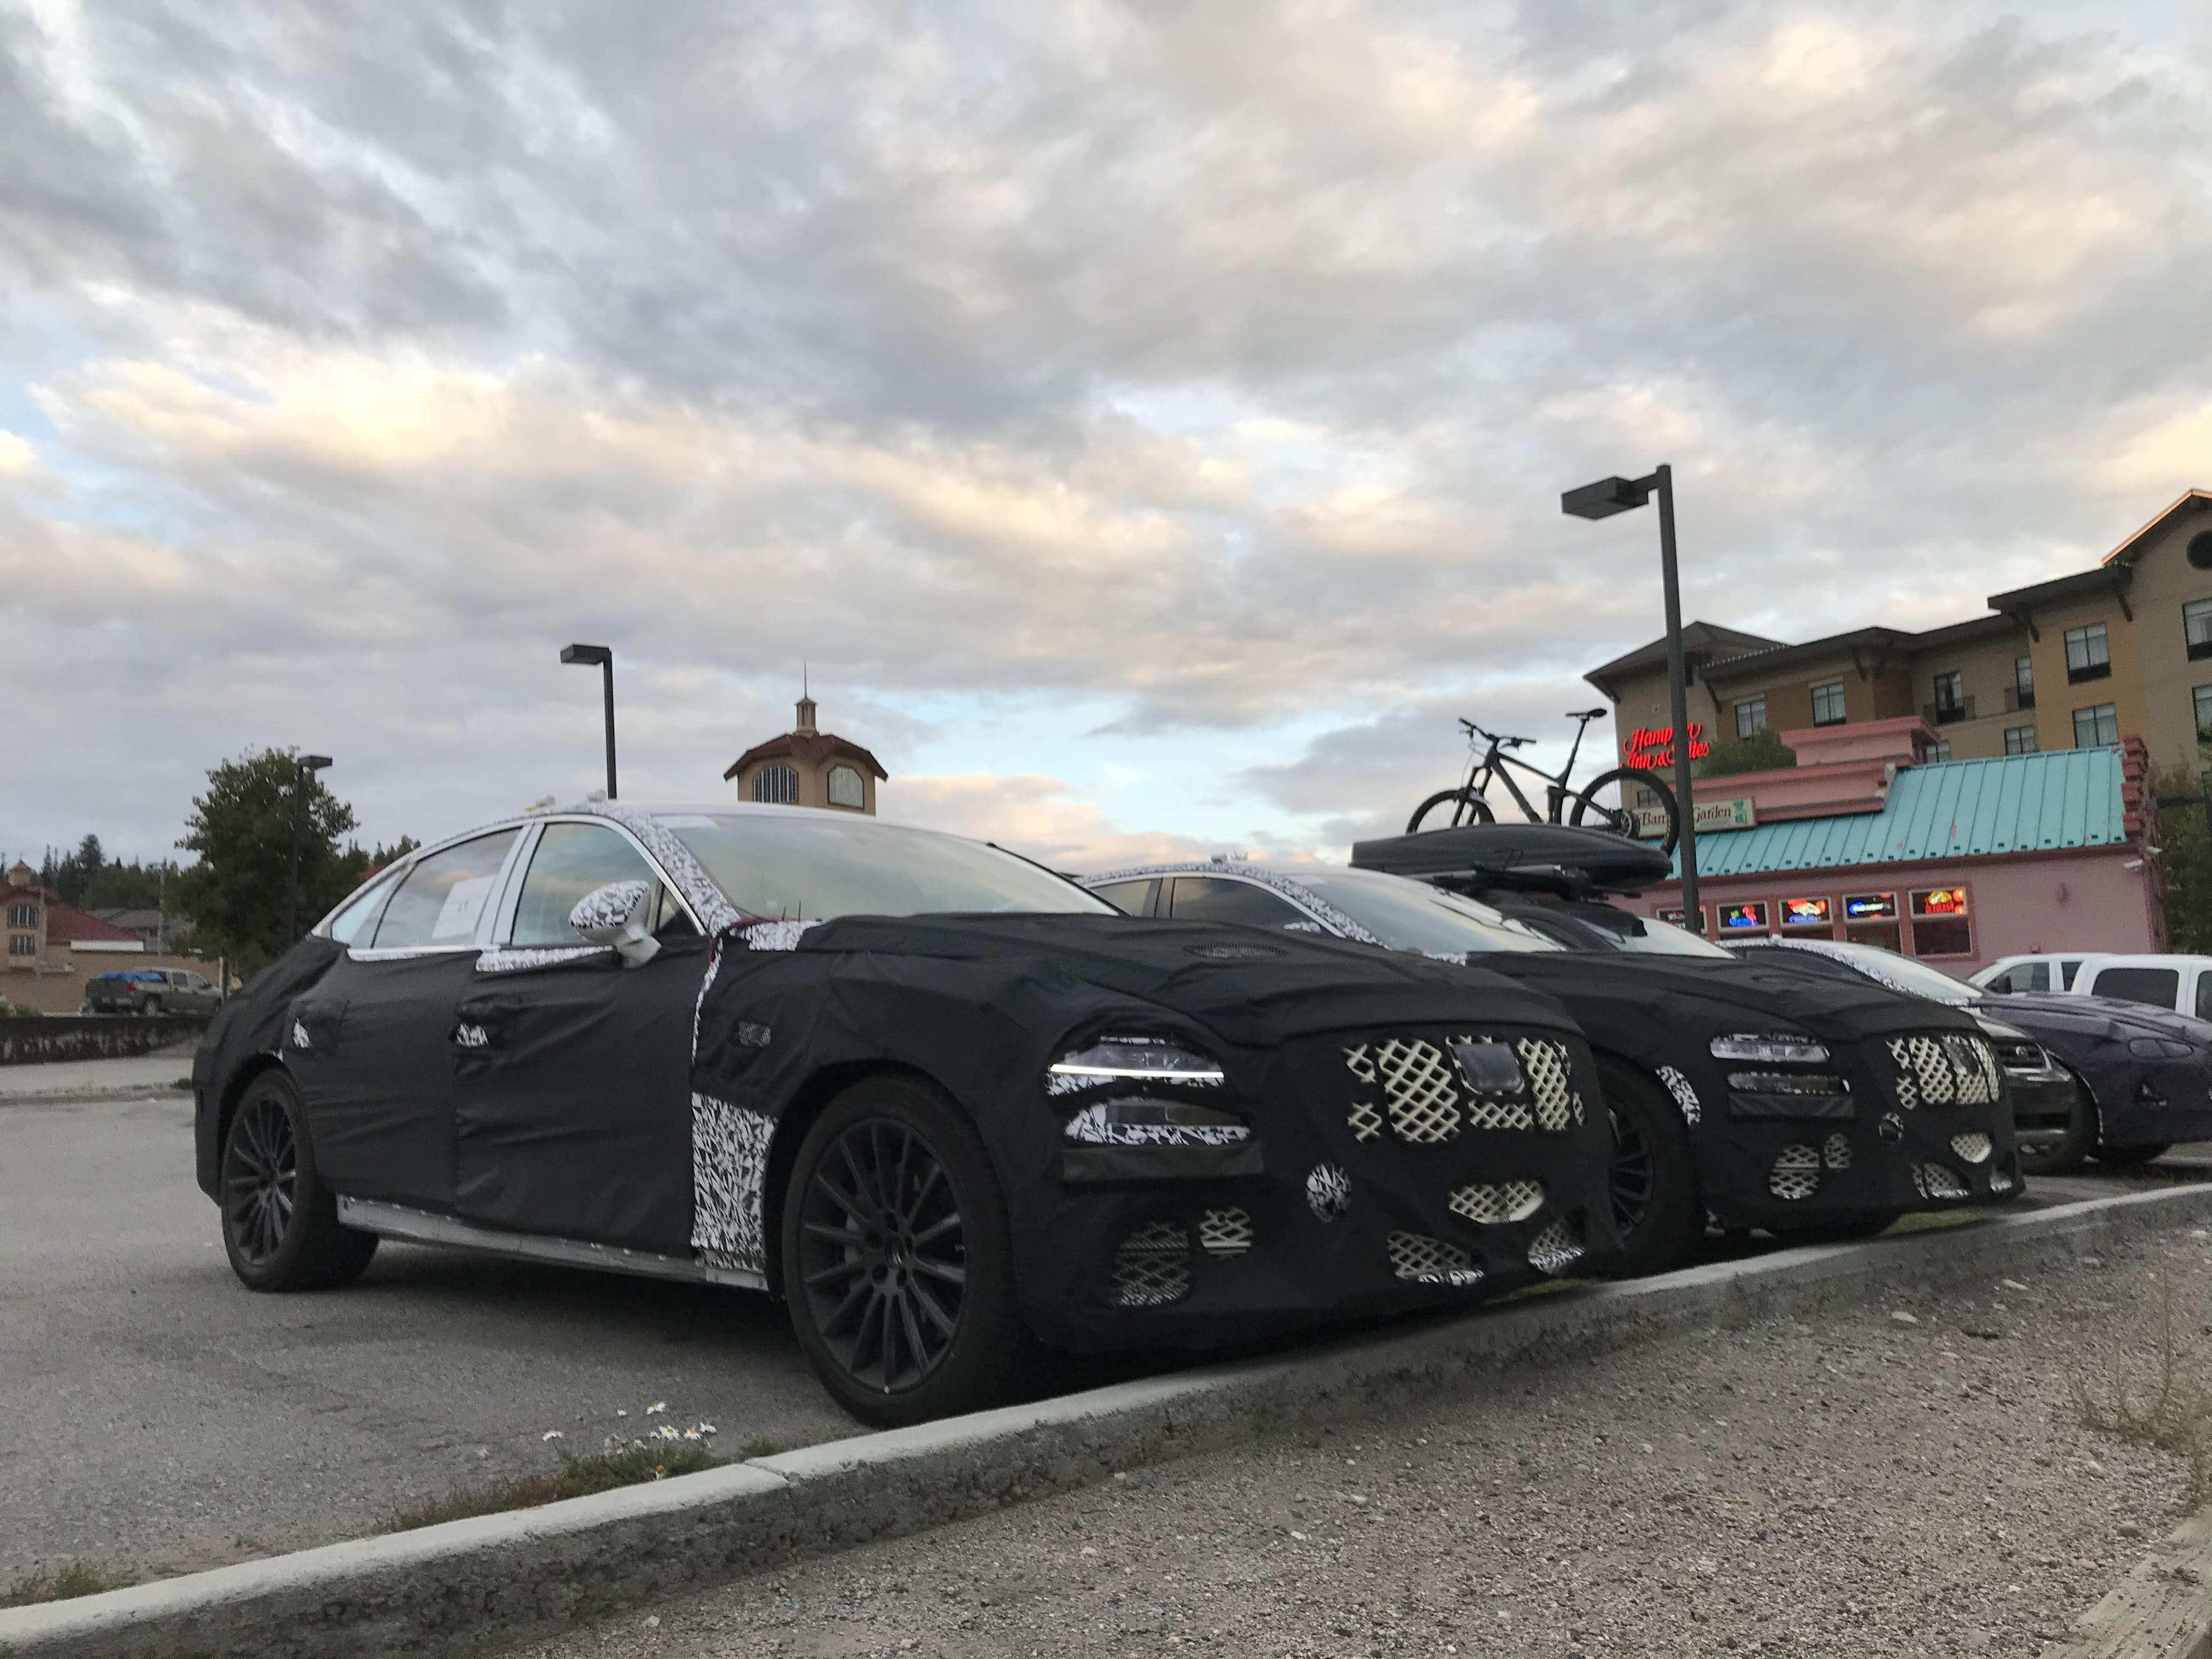 43 New Spy Shots 2020 Lincoln Mkz Sedan Performance with Spy Shots 2020 Lincoln Mkz Sedan